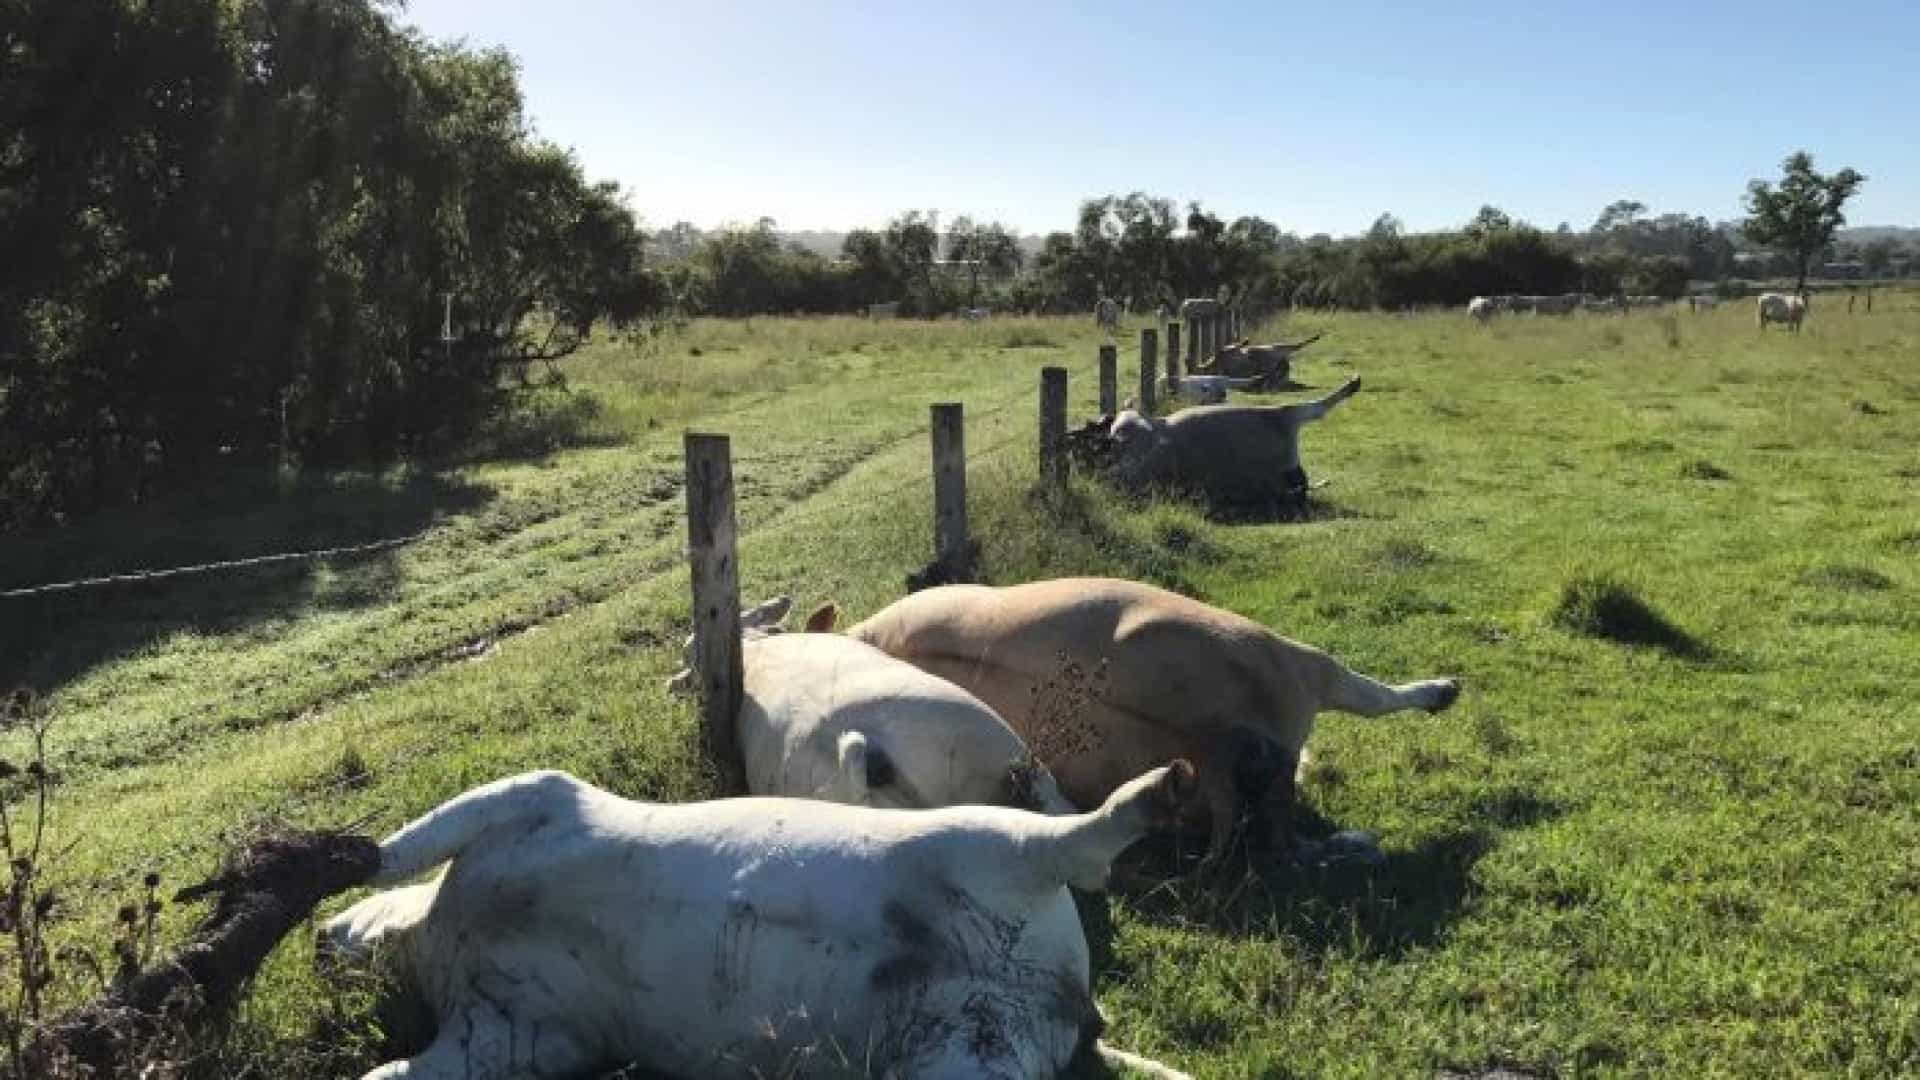 Raio matou vacas na Austrália